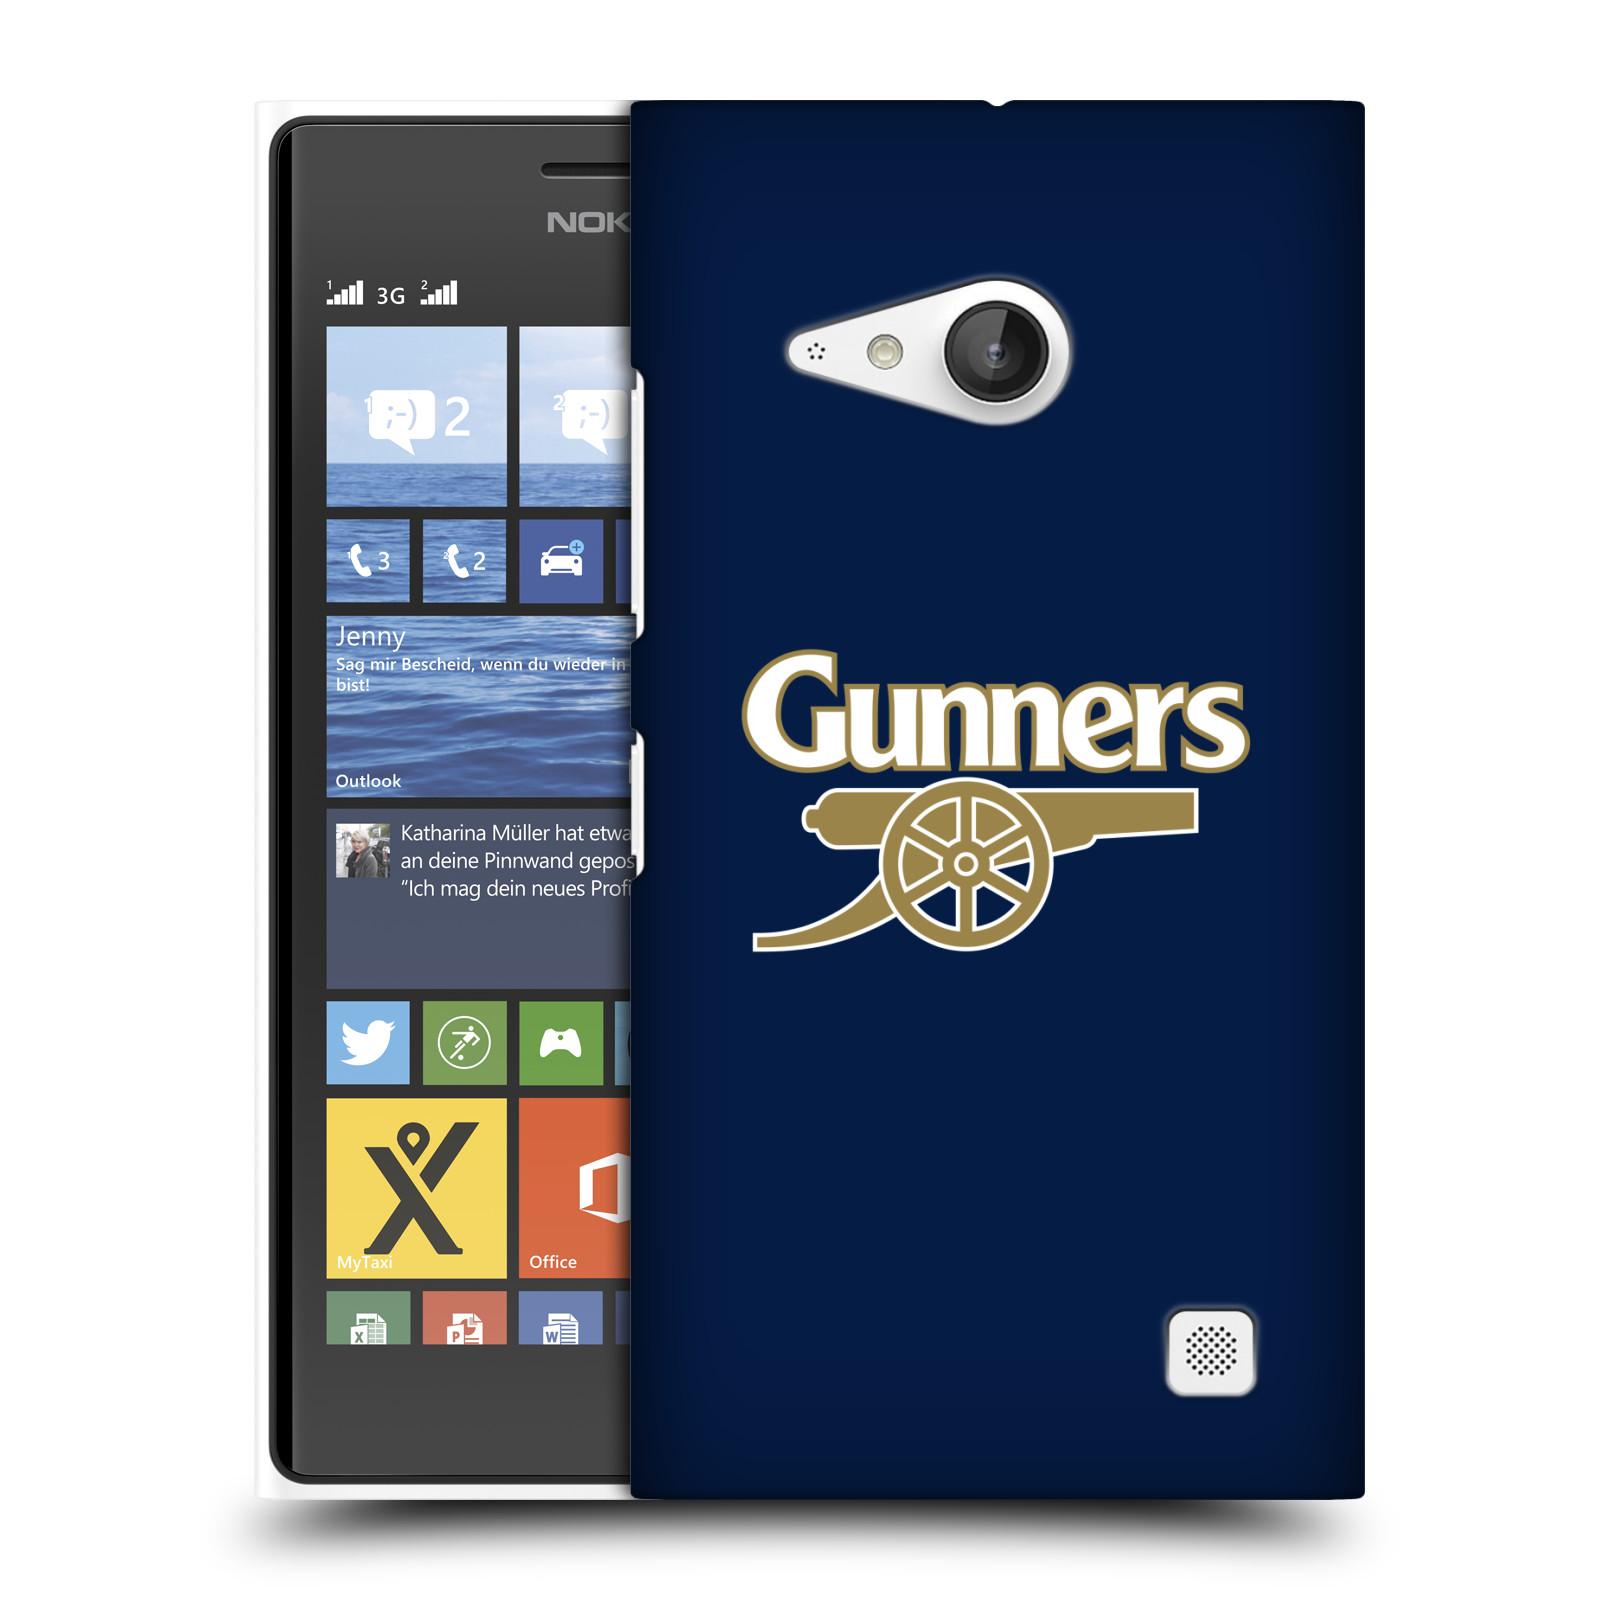 Plastové pouzdro na mobil Nokia Lumia 730 Dual SIM - Head Case - Arsenal FC - Gunners (Plastový kryt či obal na mobilní telefon s motivem klubu Arsenal FC - Gunners pro Nokia Lumia 730 Dual SIM)